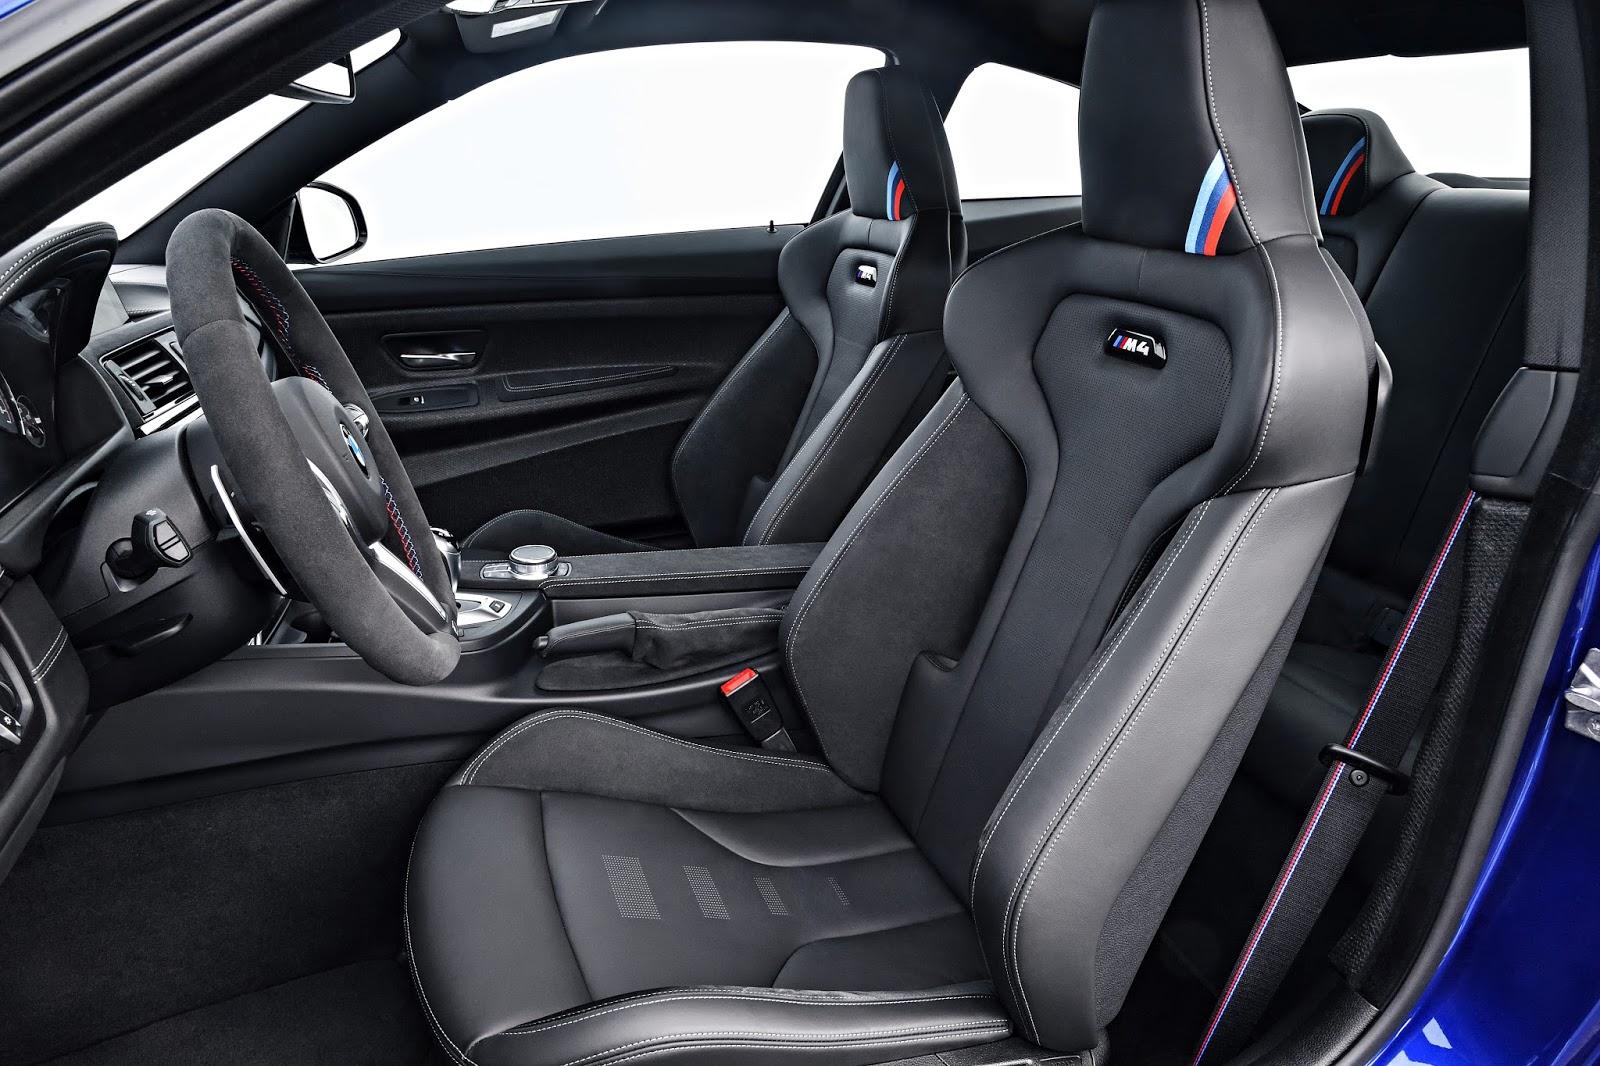 P90251064 highRes the new bmw m4 cs 04 Η περιορισμένης παραγωγής BMW M4 ClubSport δική σας με 116.900 ευρώ BMW, BMW M, BMW M4, BMW M4 CS, BMW Motorsport, clubsport, COUPE, Limited edition, supercars, supersport, videos, Περιορισμένης παραγωγής